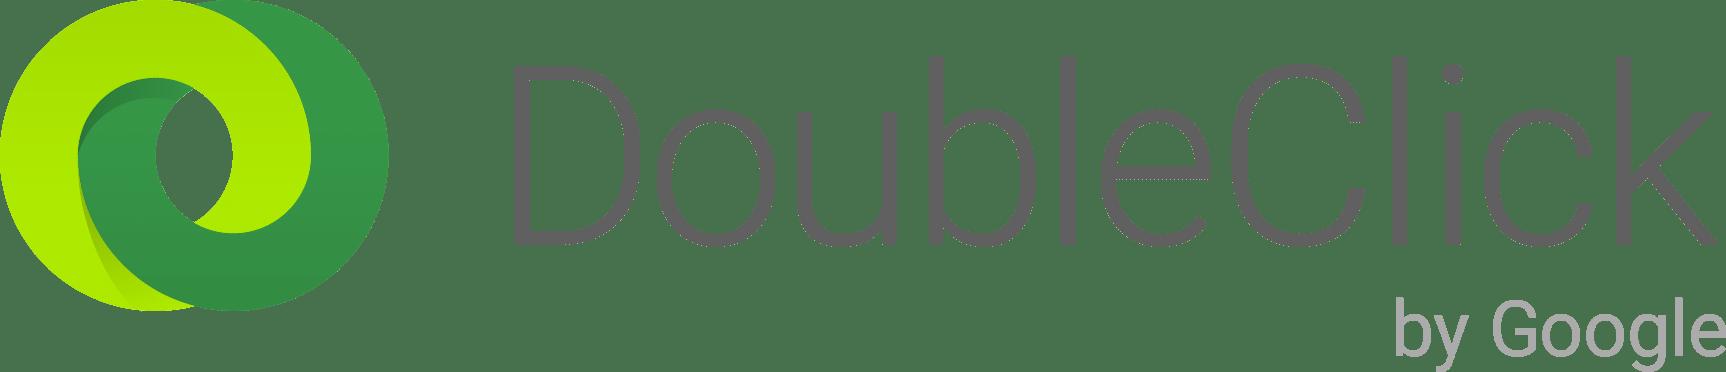 Google DoubleClick Logo